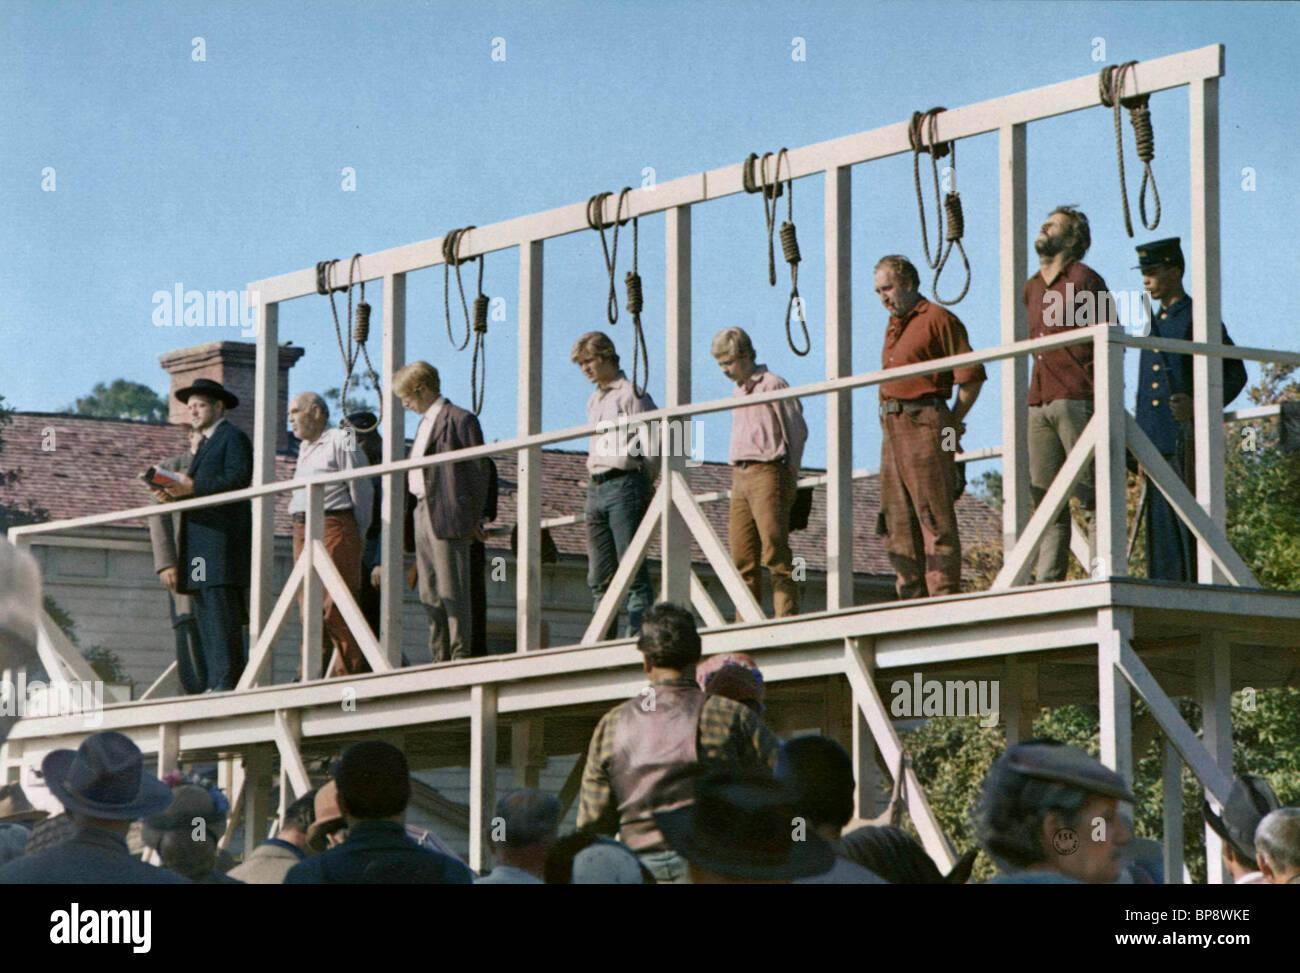 HANGING GALLOWS HANG 'EM HIGH (1968) - Stock Image